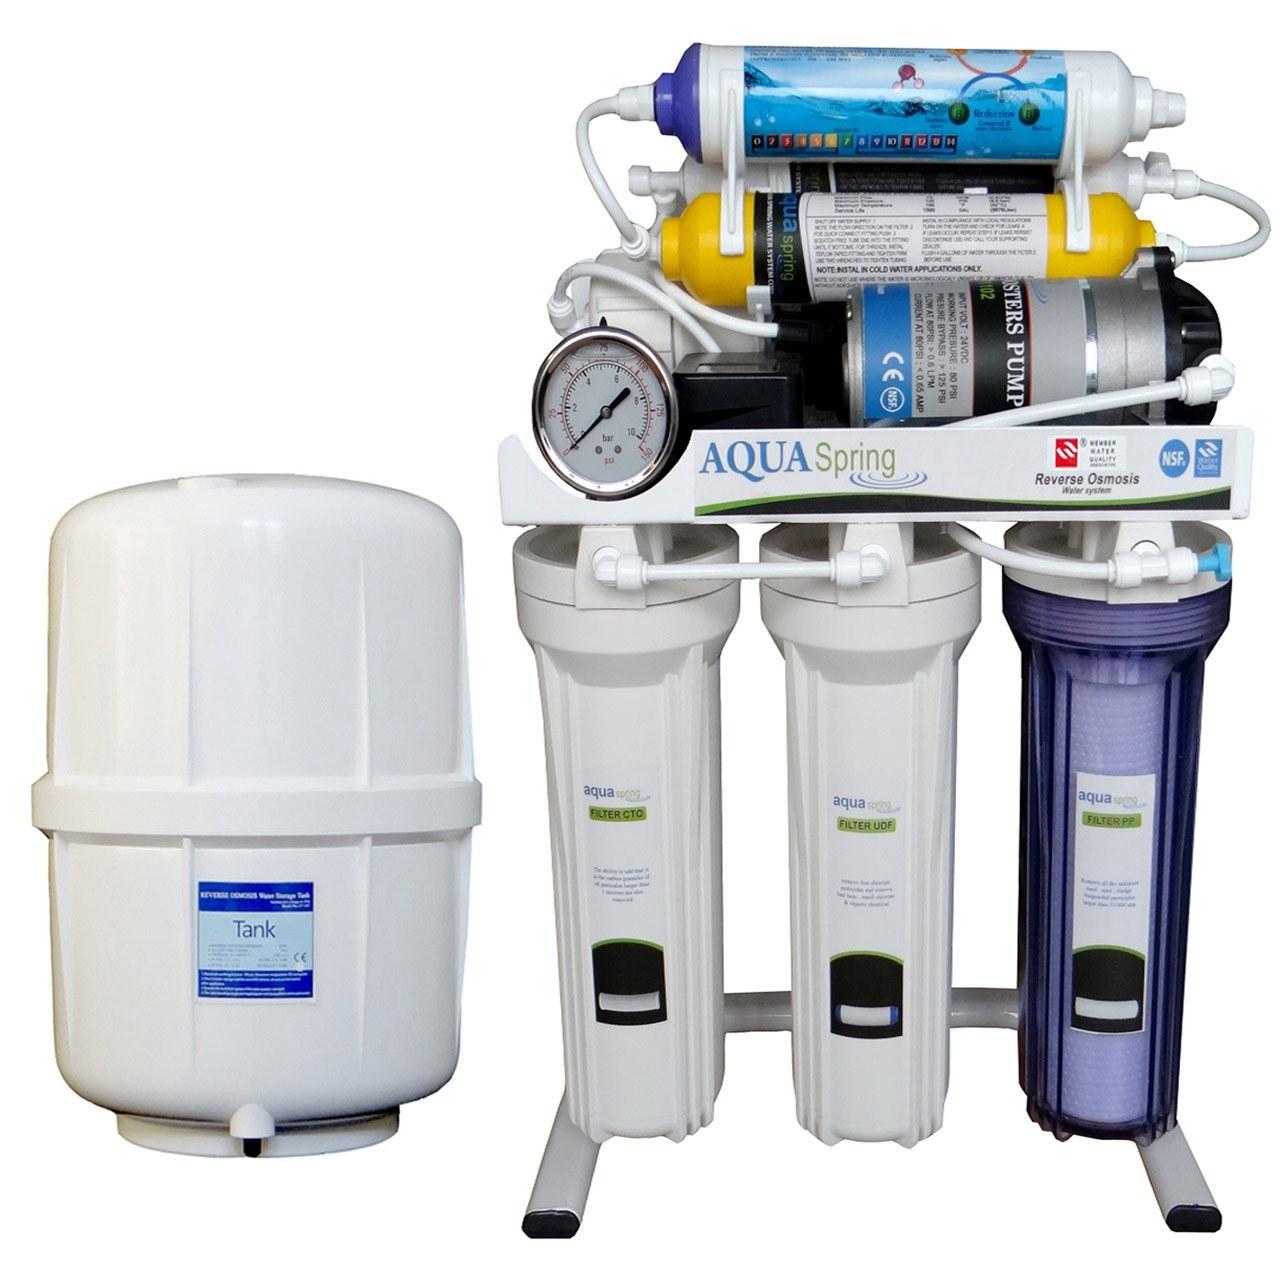 تصویر تصفیه آب خانگی آکوآاسپرینگ مدل RO-S151 Aquaspring RO-S151 Water Purifier